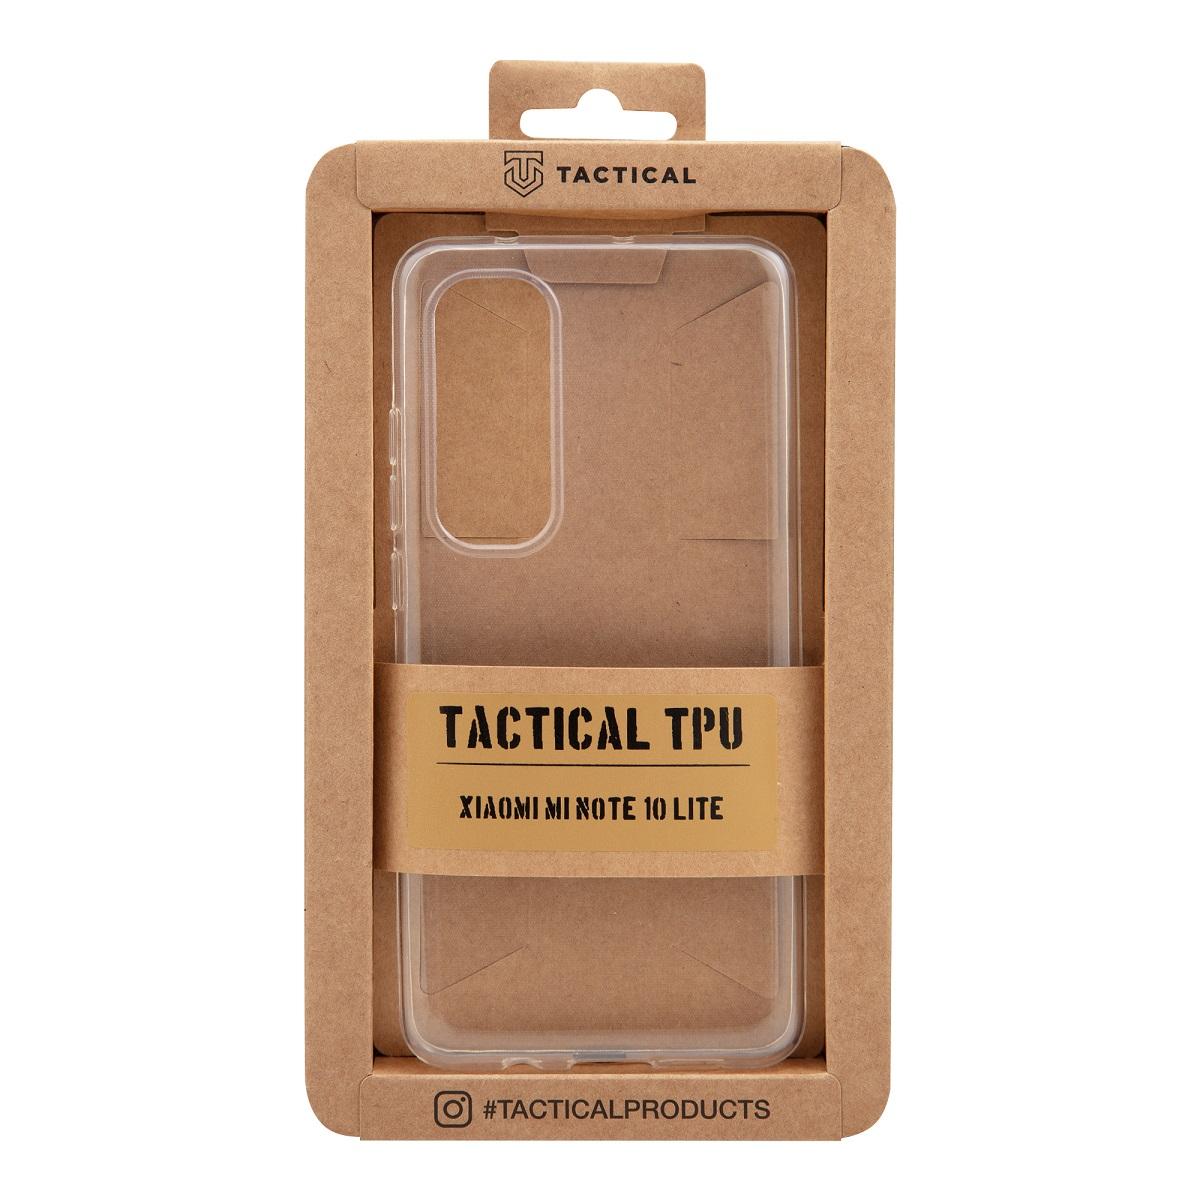 Tactical silikonové pouzdro, obal, kryt Xiaomi Mi Note 10 Lite transparent